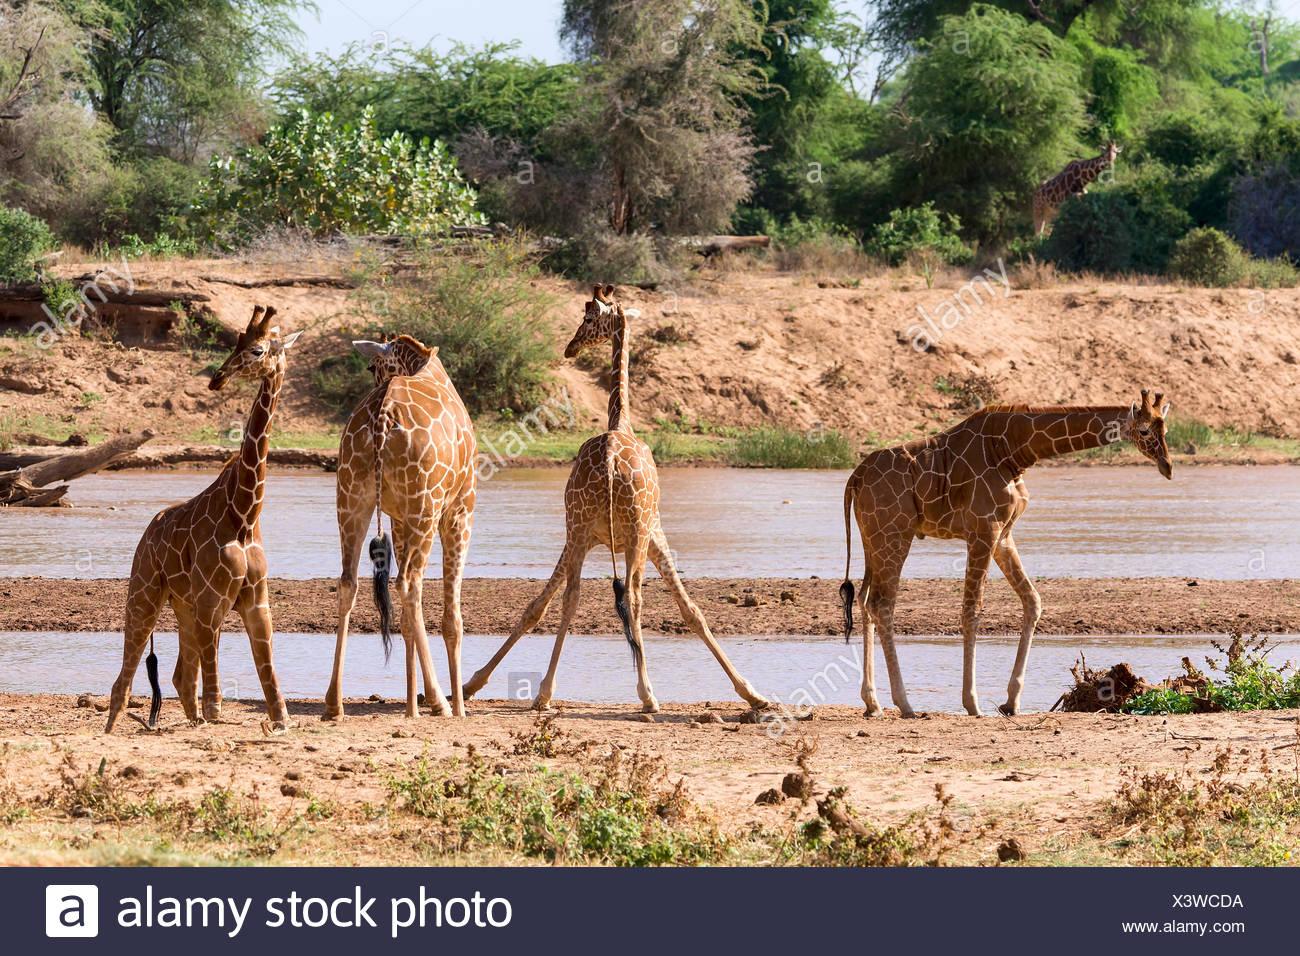 Reticulated giraffes or Somali giraffes (Giraffa reticulata camelopardalis) by river, Samburu National Reserve, Kenya Stock Photo